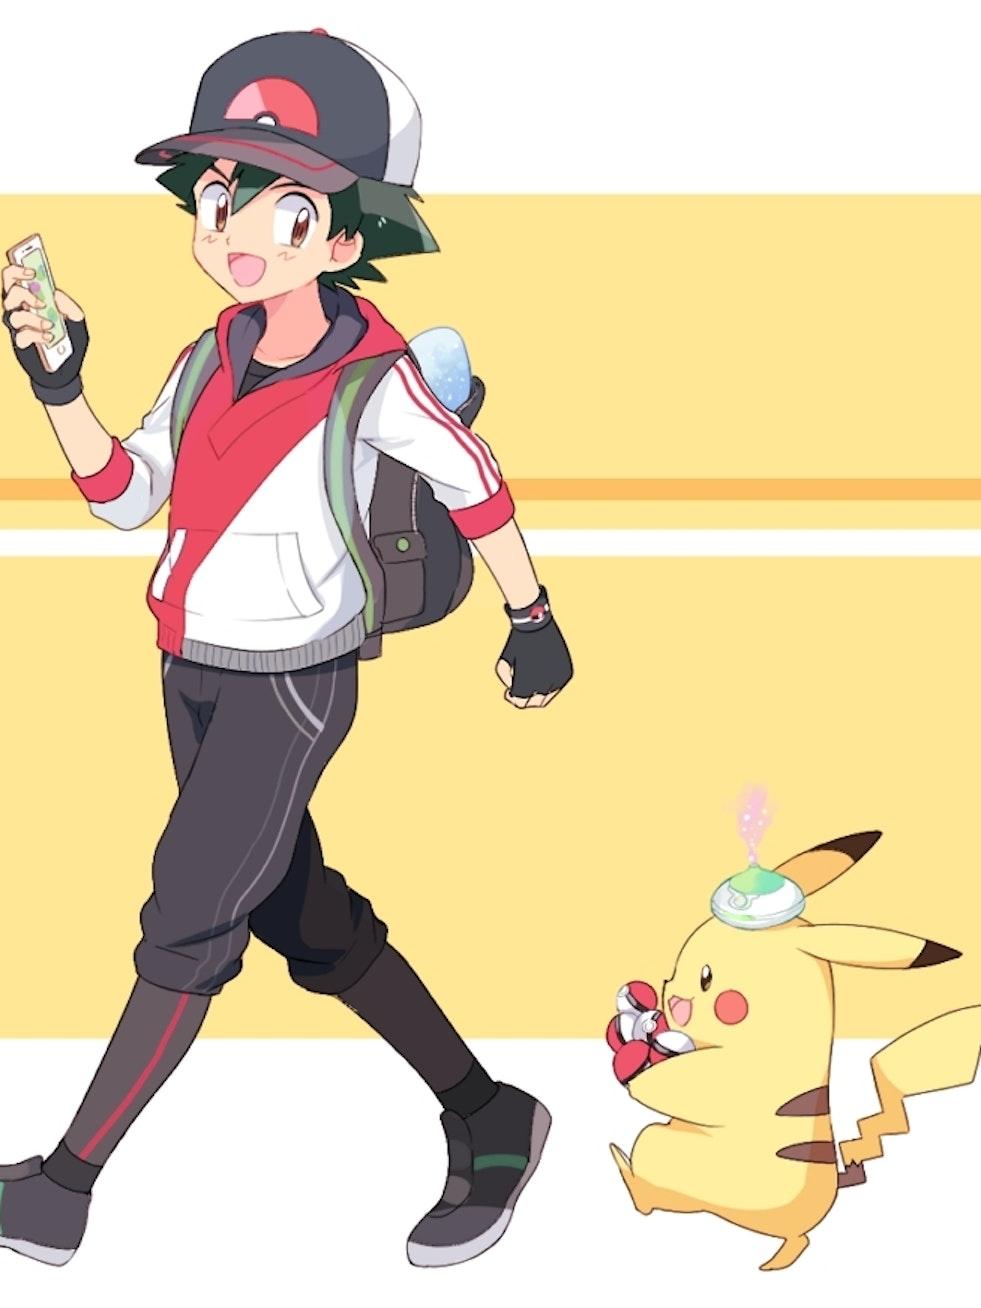 Pokémon Go and Ash Ketchum